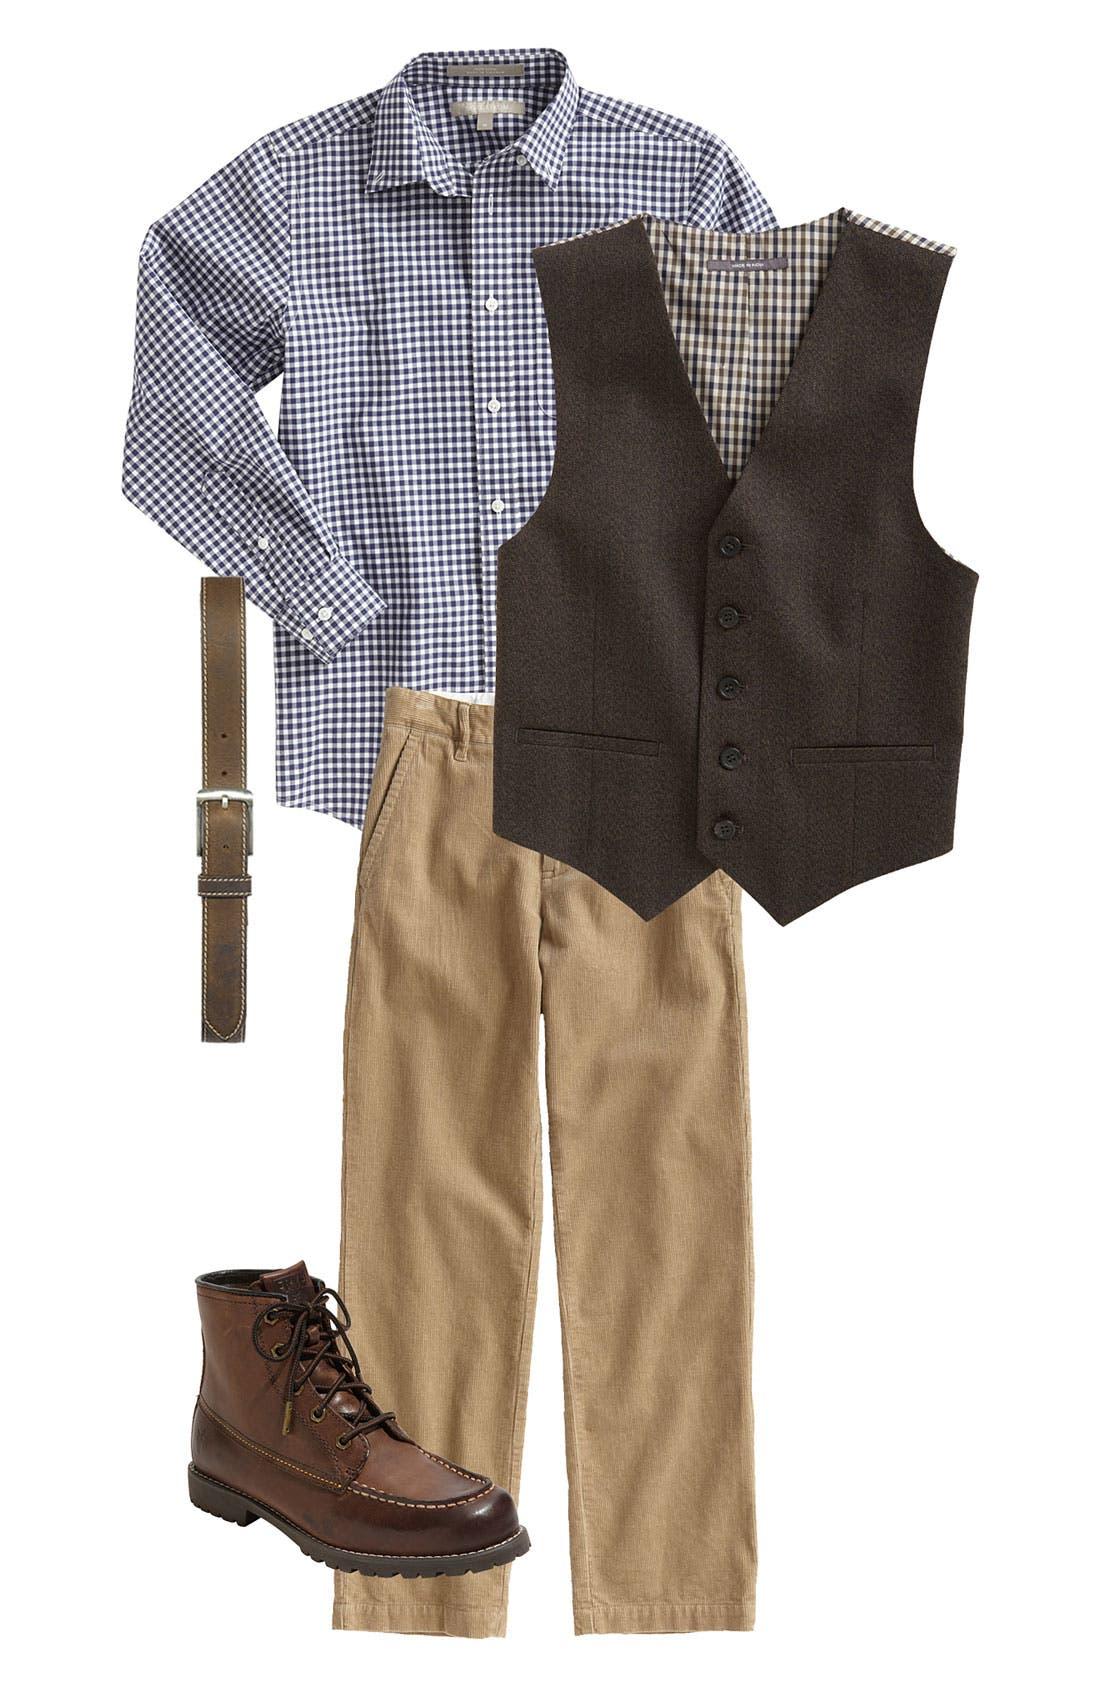 Alternate Image 2  - Nordstrom 'Edward' Corduroy Trousers (Big Boys)